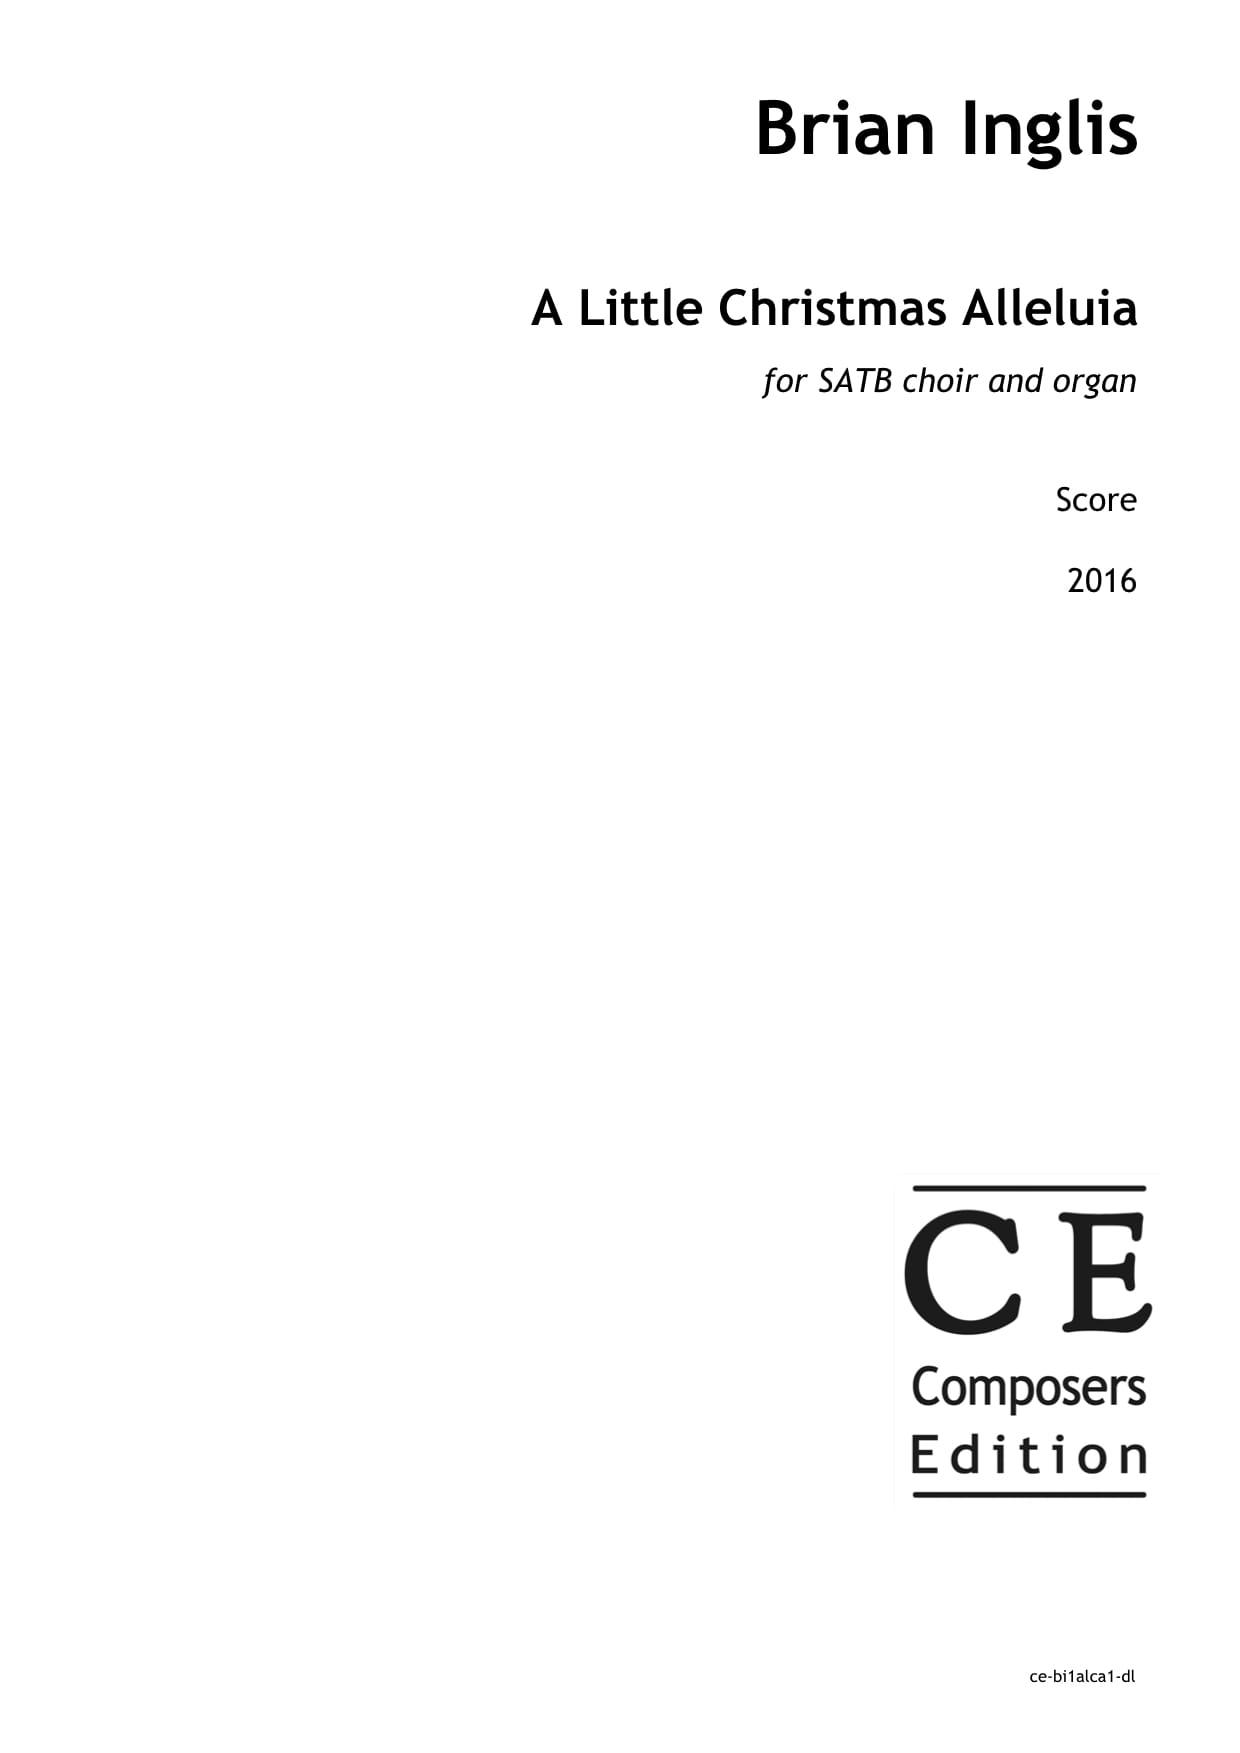 Brian Inglis: A Little Christmas Alleluia for SATB choir and organ